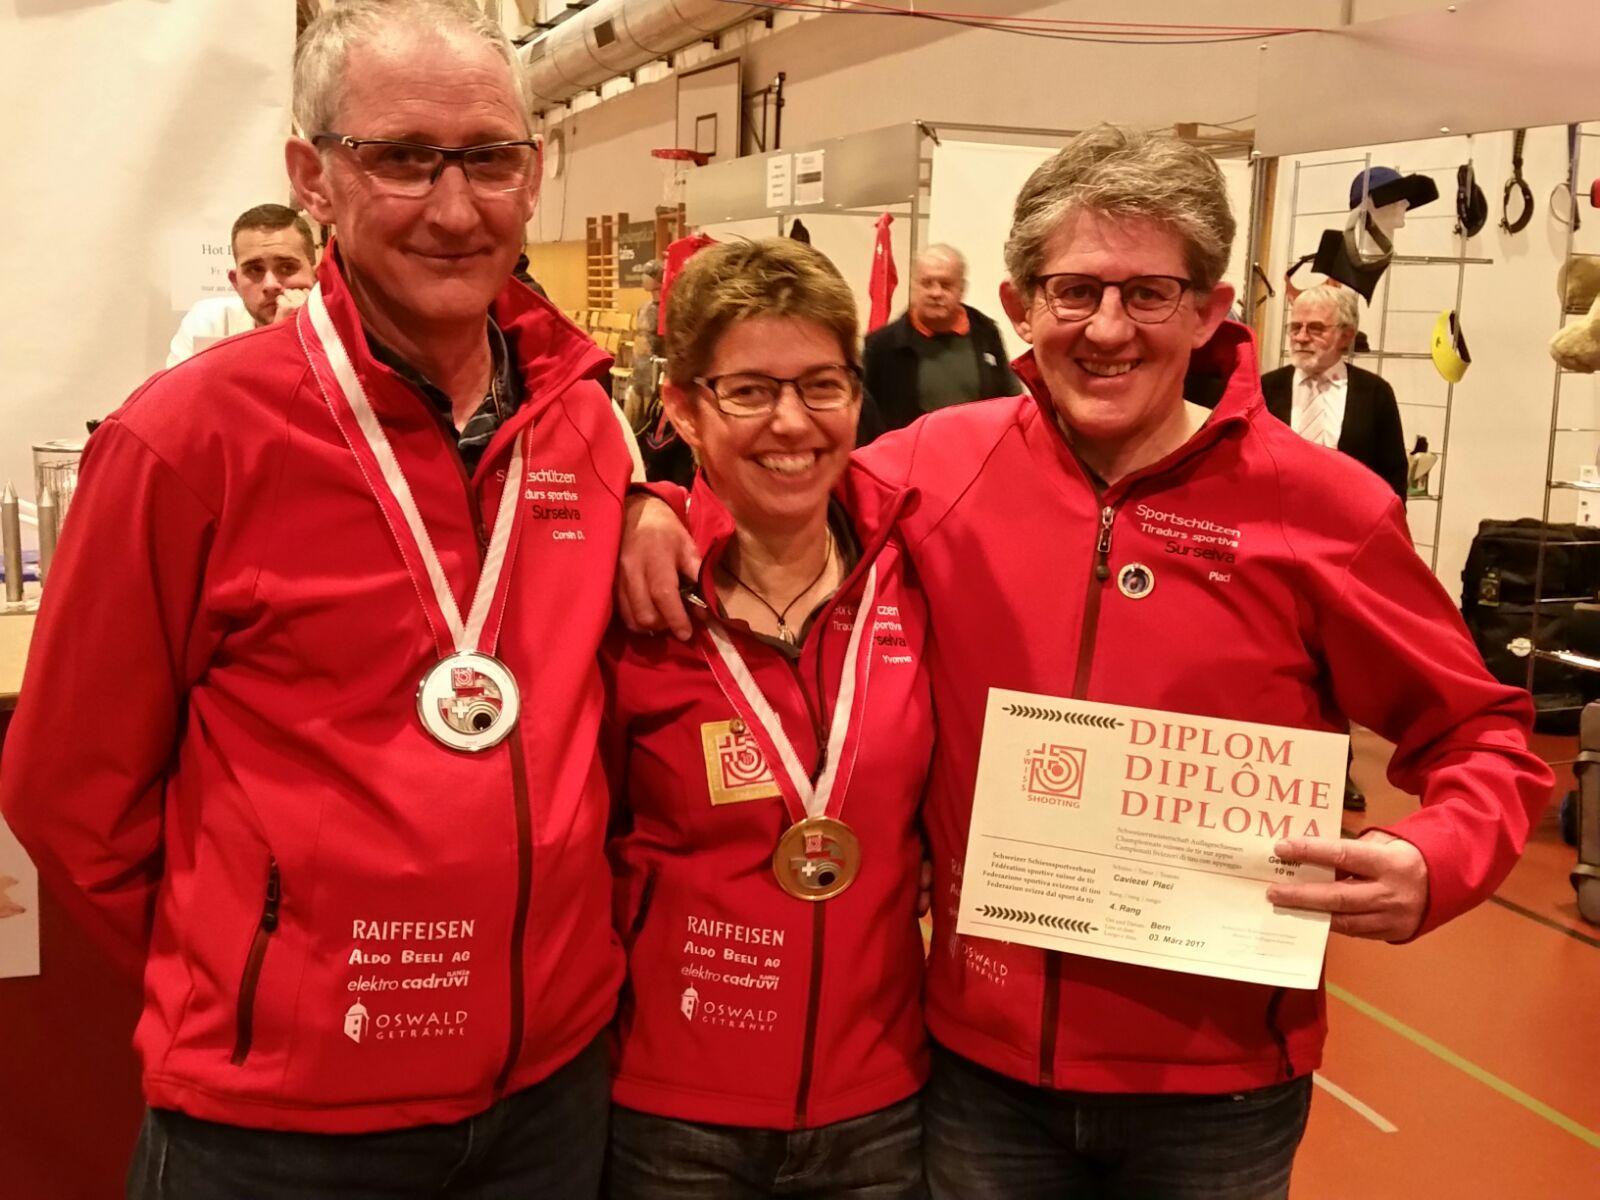 10m Schweizermeisterschaft 2017 in Bern - Senioren Gold Yvonne M., Silber Corsin D., Diplom Placi C.